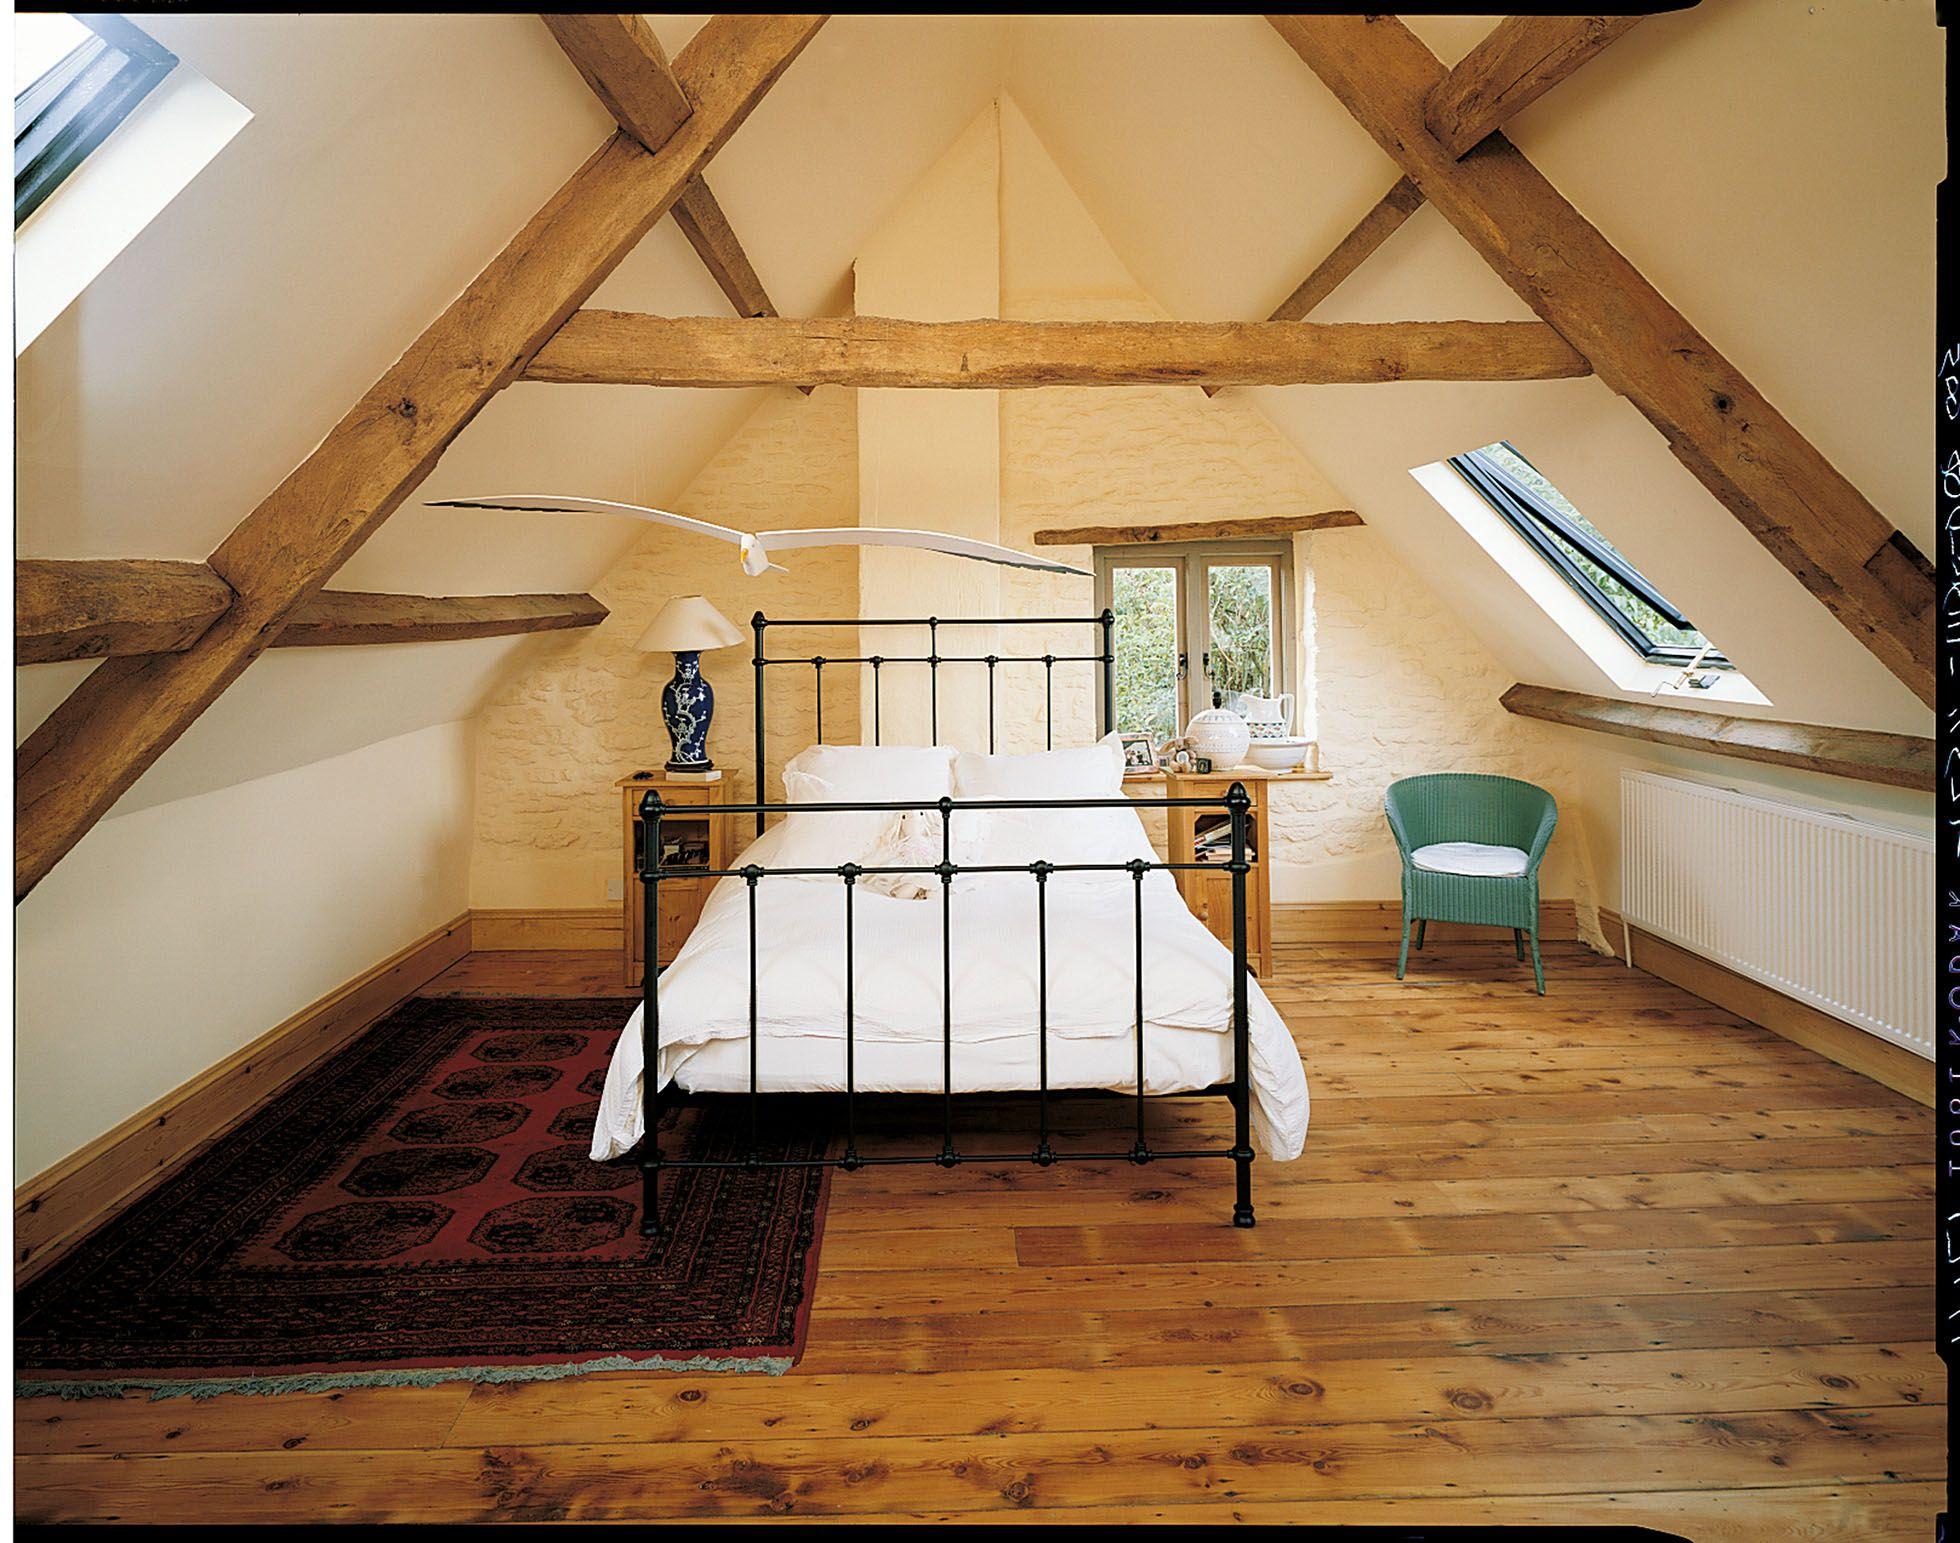 Loft bedroom regulations  Loft Conversion Design Guide  Dormer Bedrooms  Pinterest  Lofts